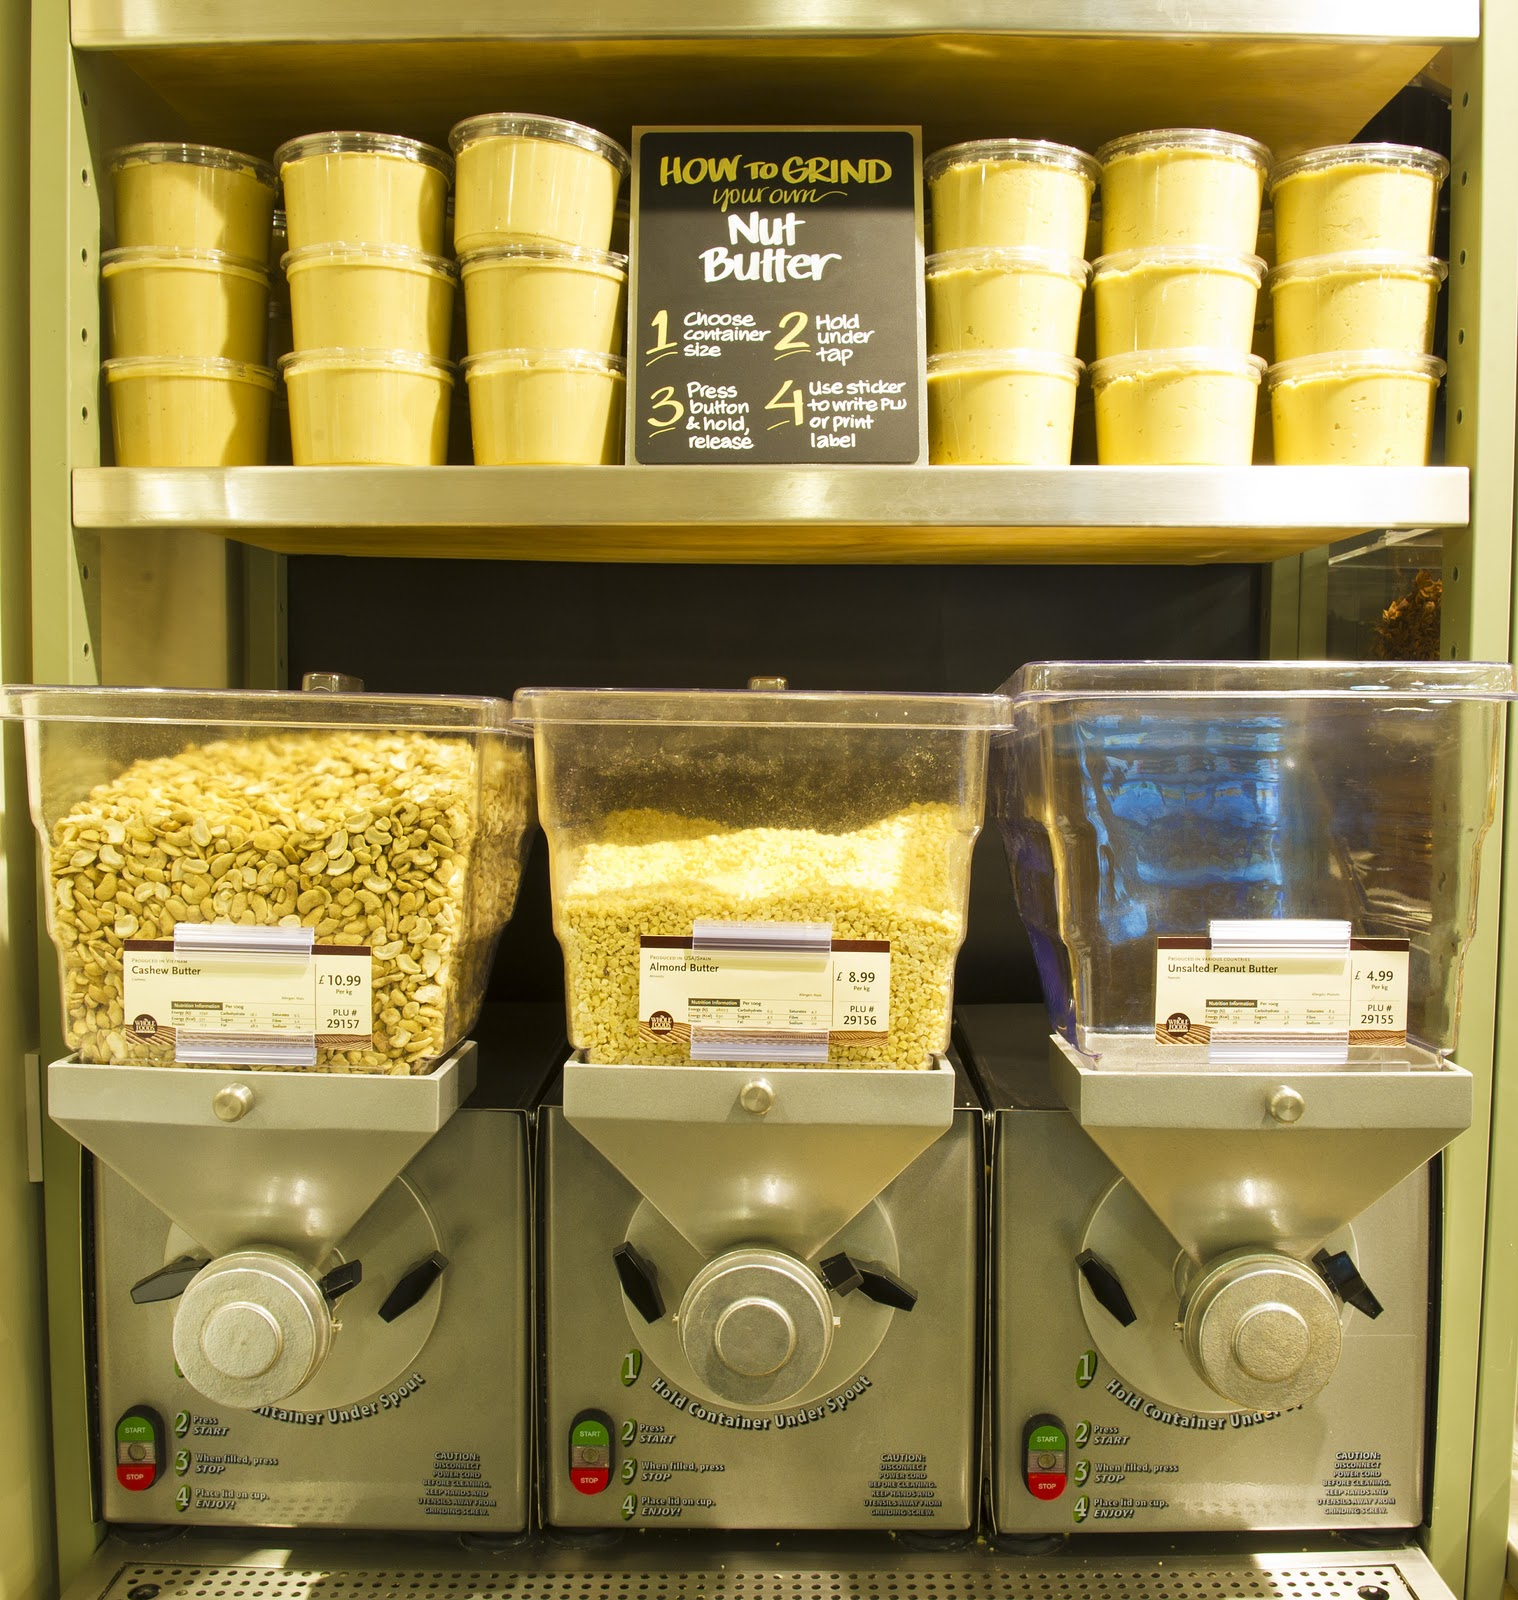 The famous peanut butter machine!